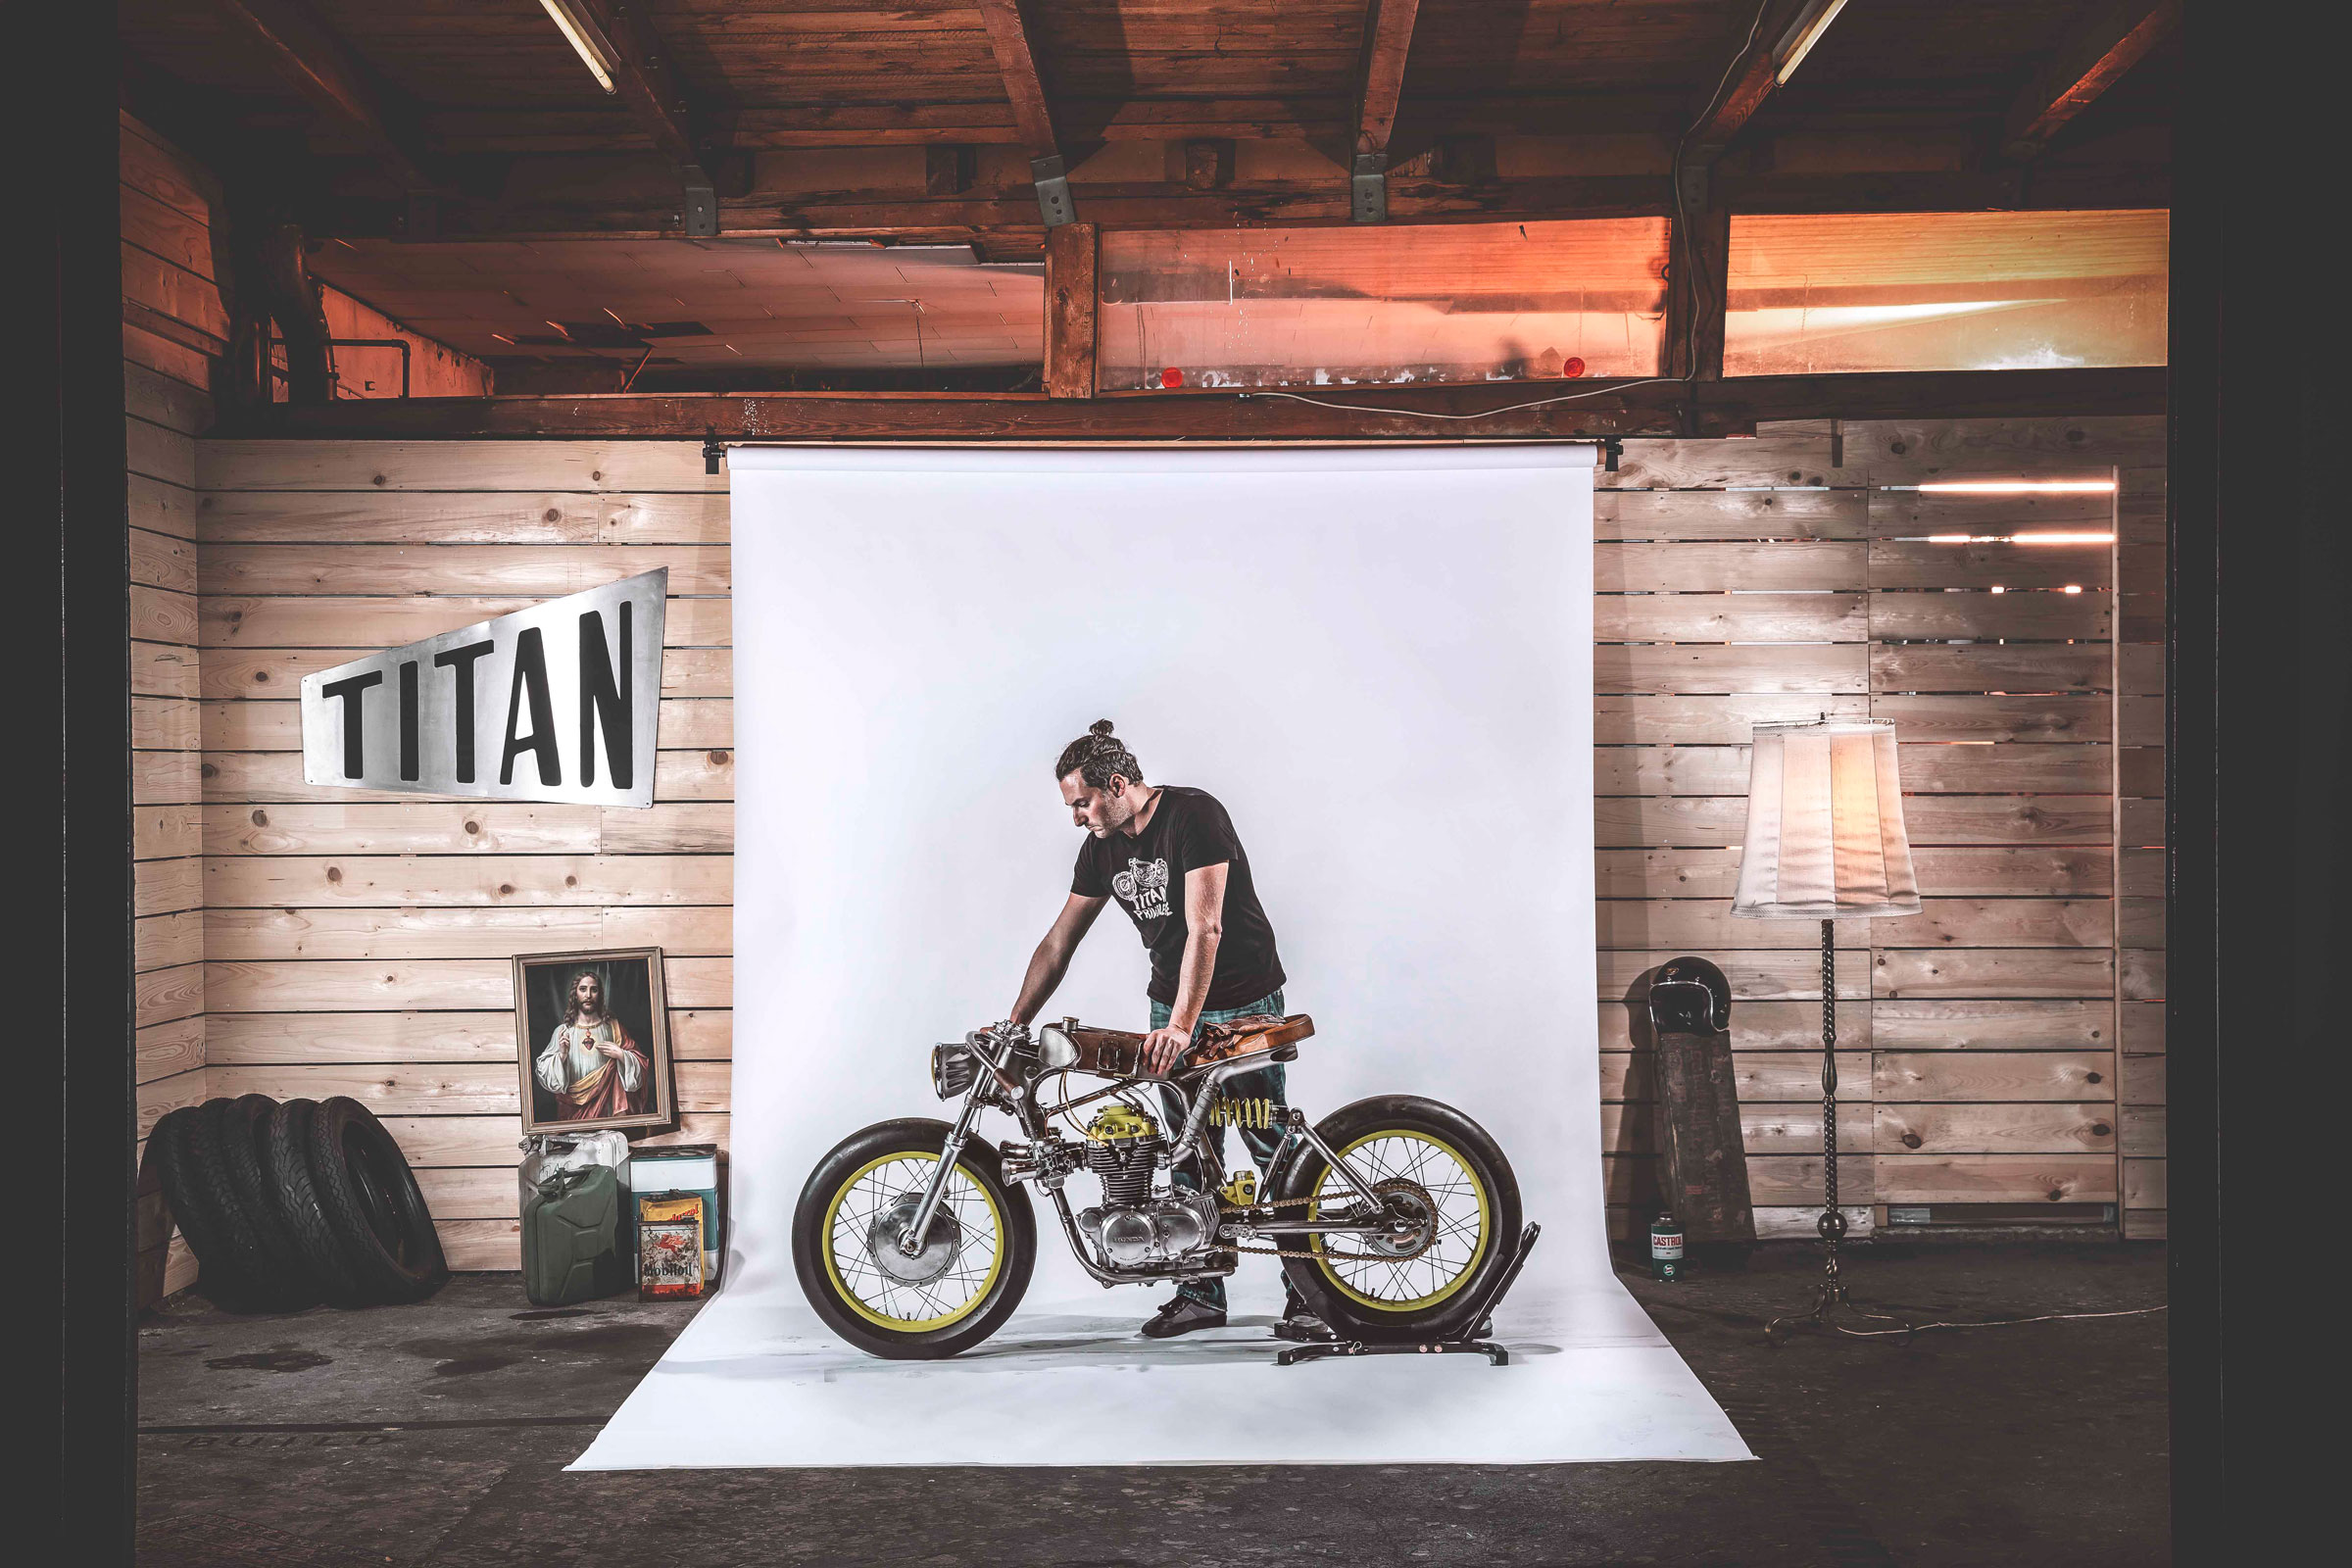 Titan-One_Alte-Maschinen-Custom-Cafe-Racer-Graz-Reduktion-Kunstwerk-Zulassung-Typisiert-TÜV_Bike-Styira-Oldtimer-Konzept-Honda-Umbau_staatsmeister-Viertelmeile-Rennen-Michl